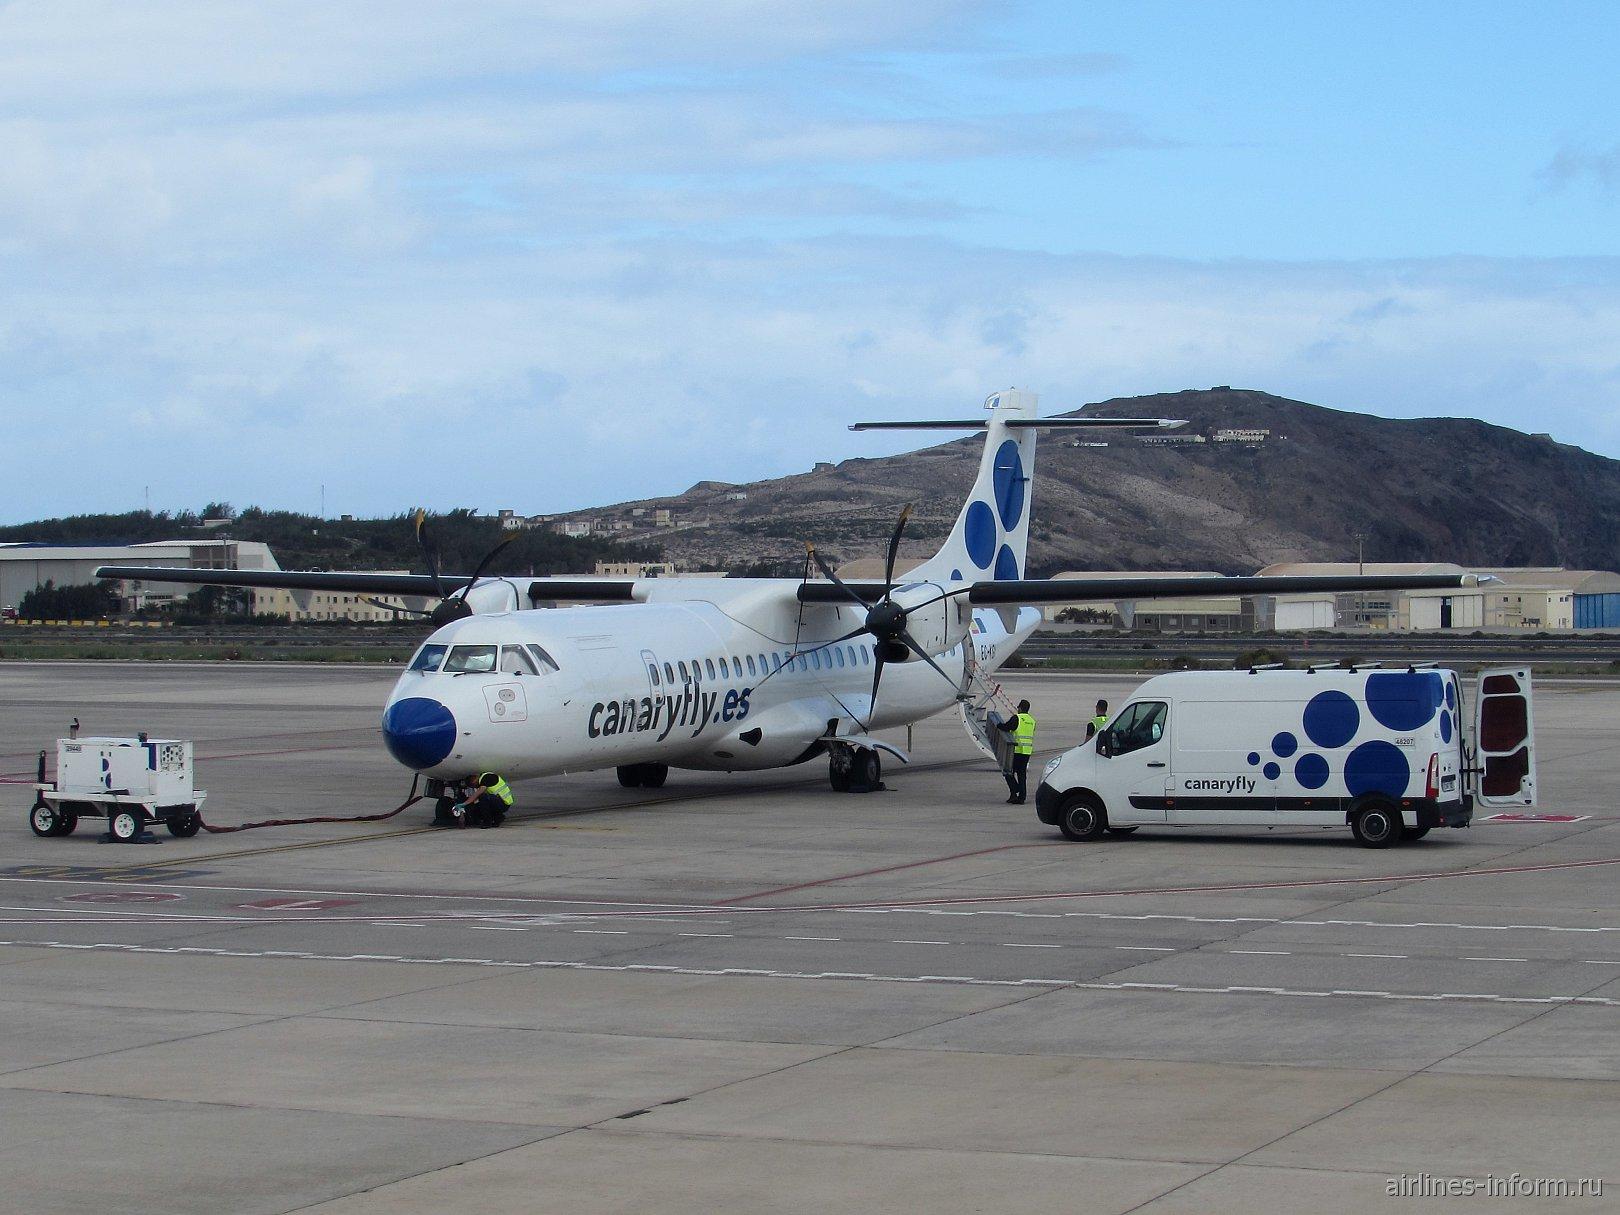 Самолет ATR 72-500 авиакомпании Canaryfly в аэропорту Гран-Канария